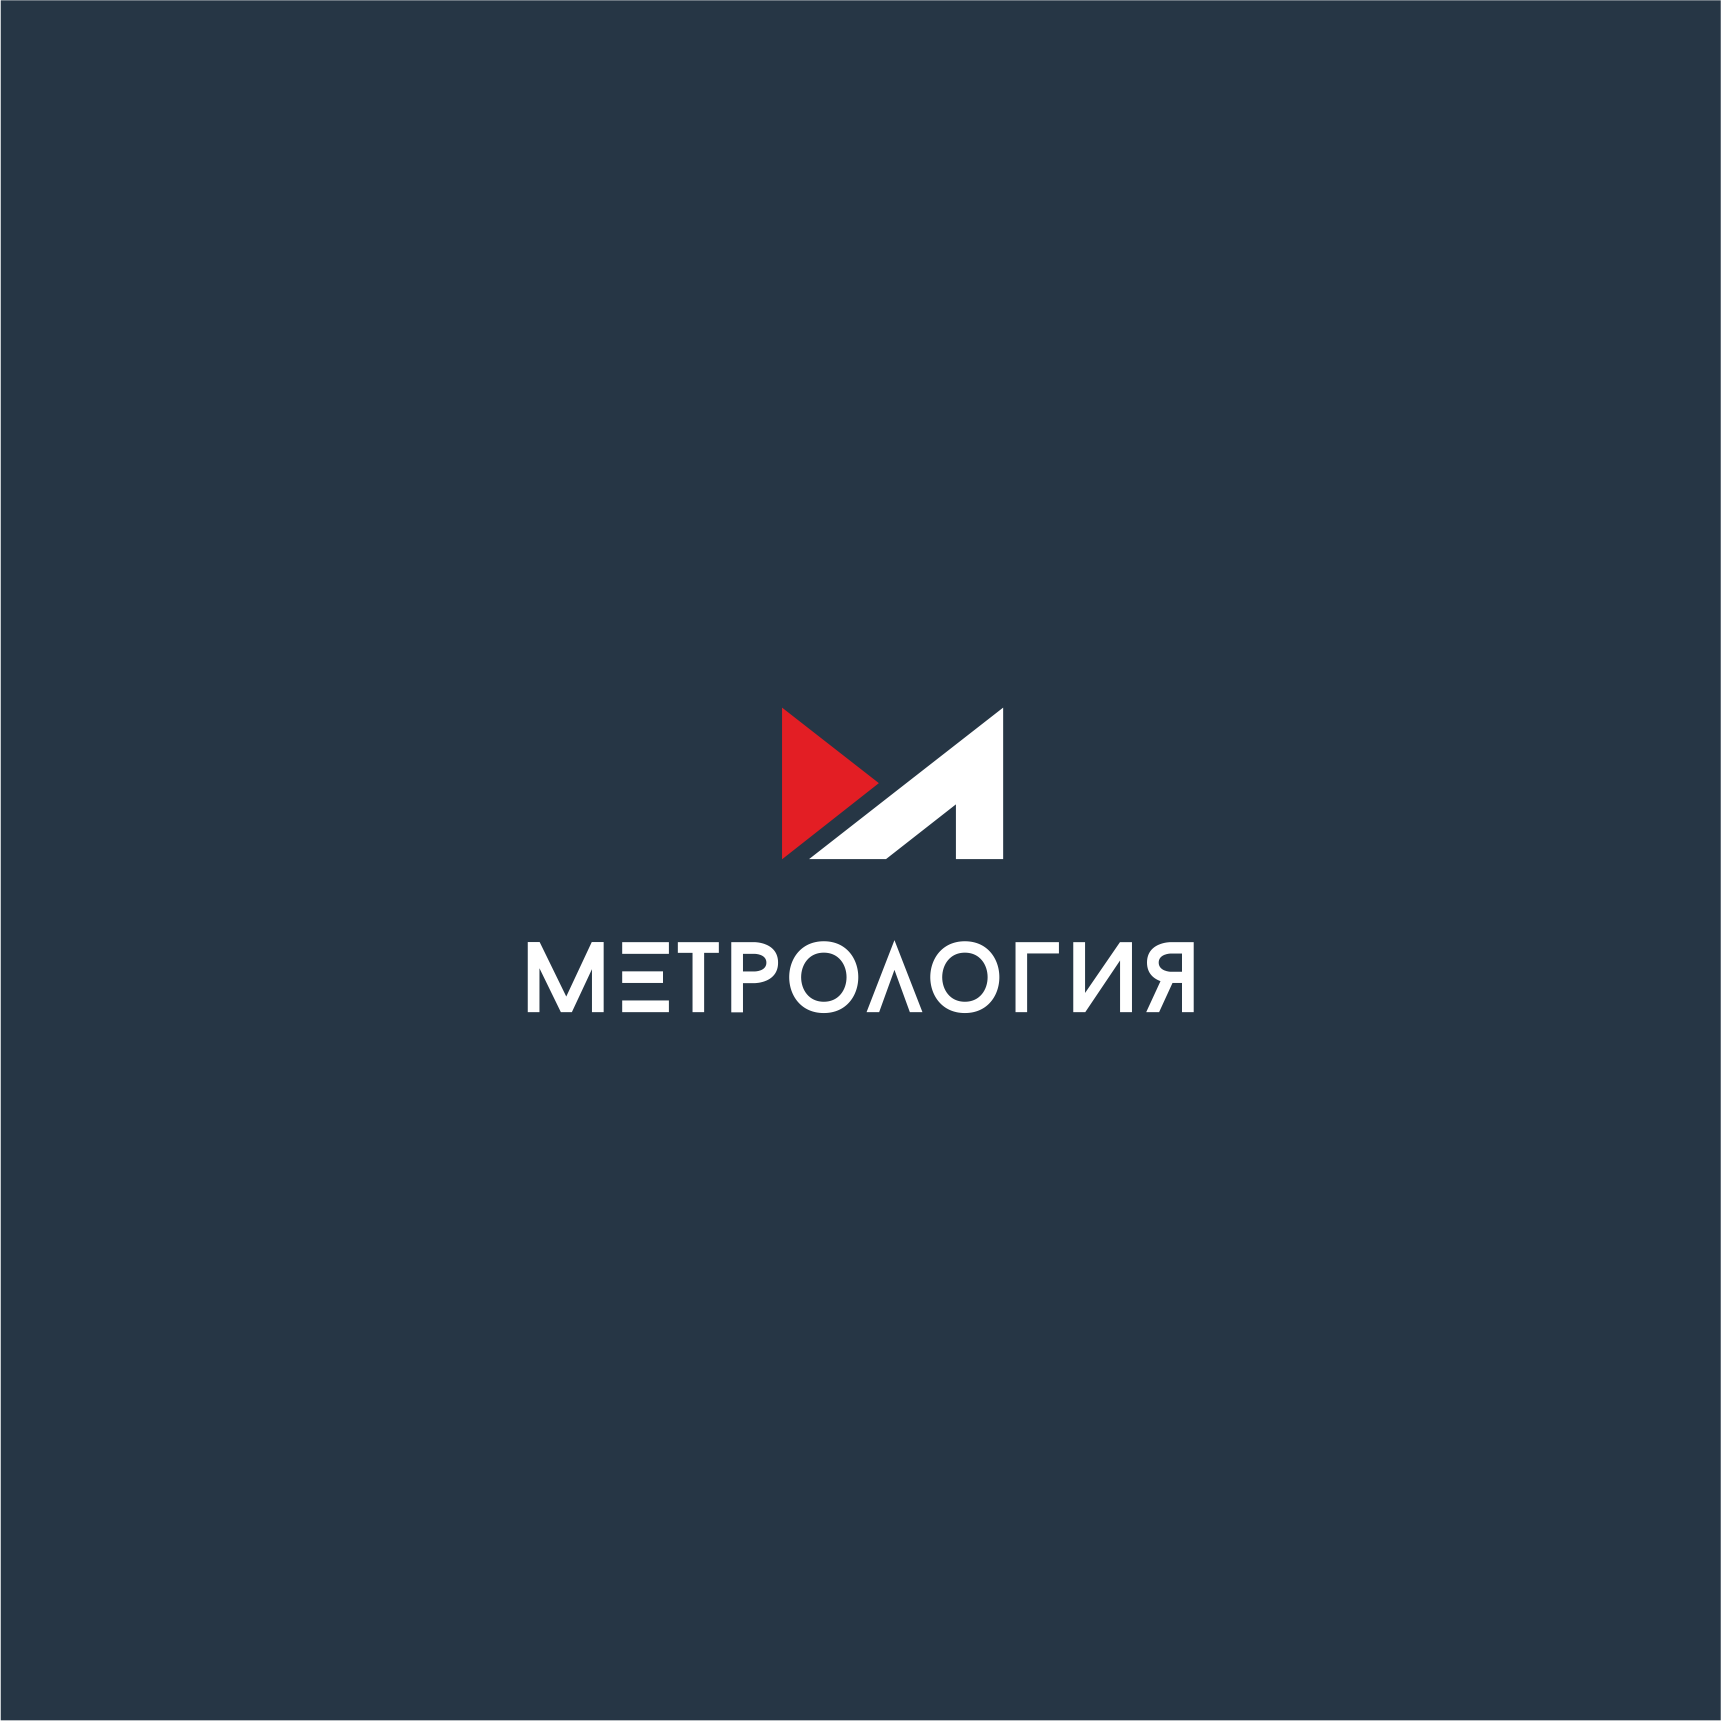 Разработать логотип, визитку, фирменный бланк. фото f_90958f7b7c200e4c.png